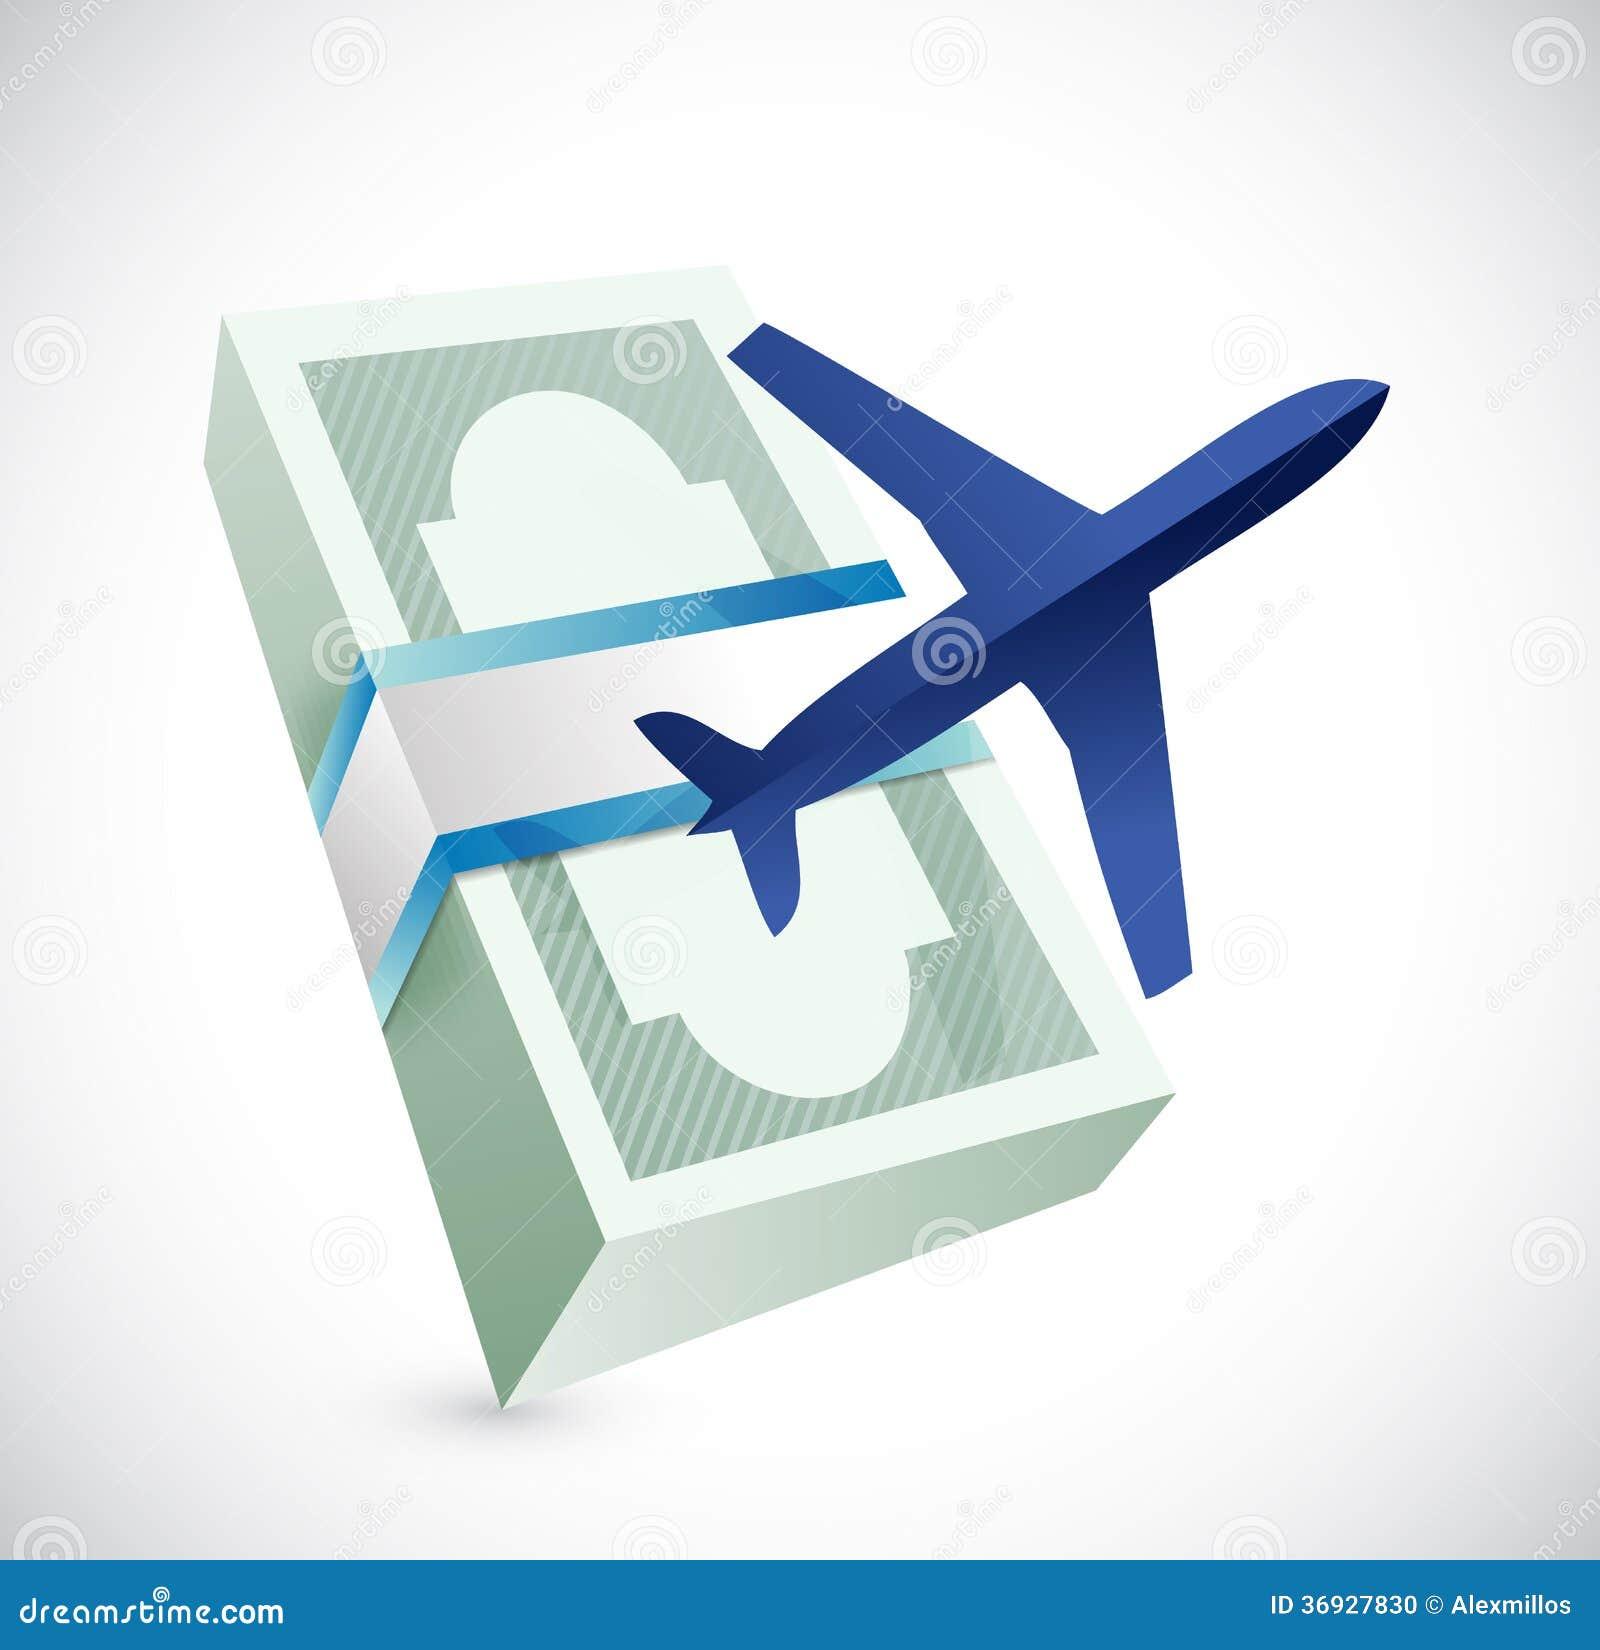 Travel Cost Illustration Design Stock Illustration